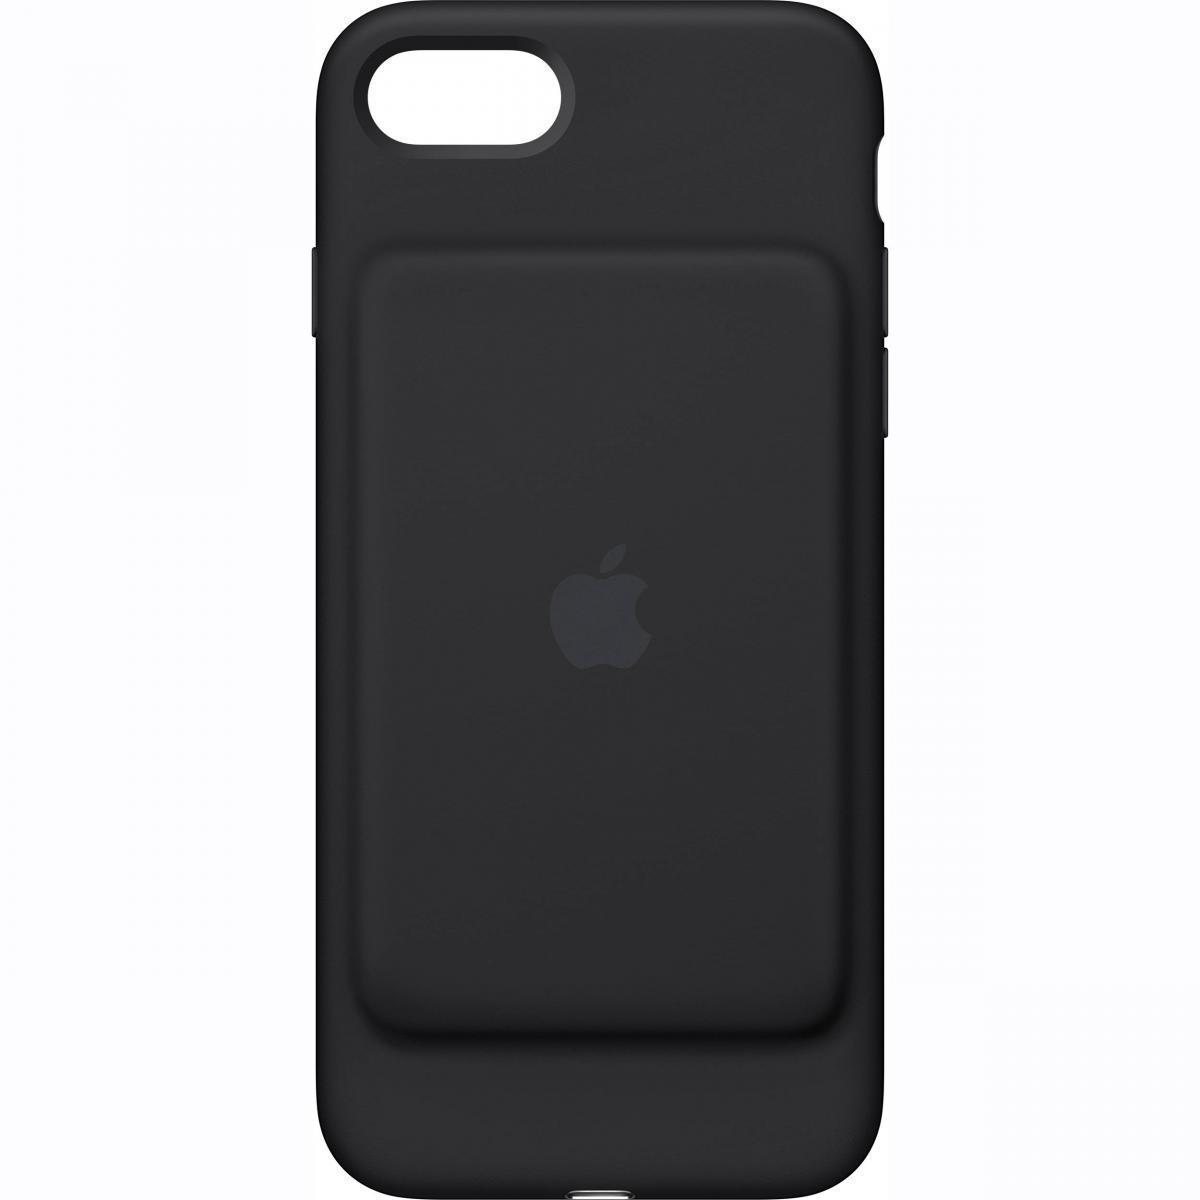 Купить Чехол-аккумулятор Apple Smart Battery Case MN002ZM/A 2365 mAh для iPhone 7/8 силикон Black